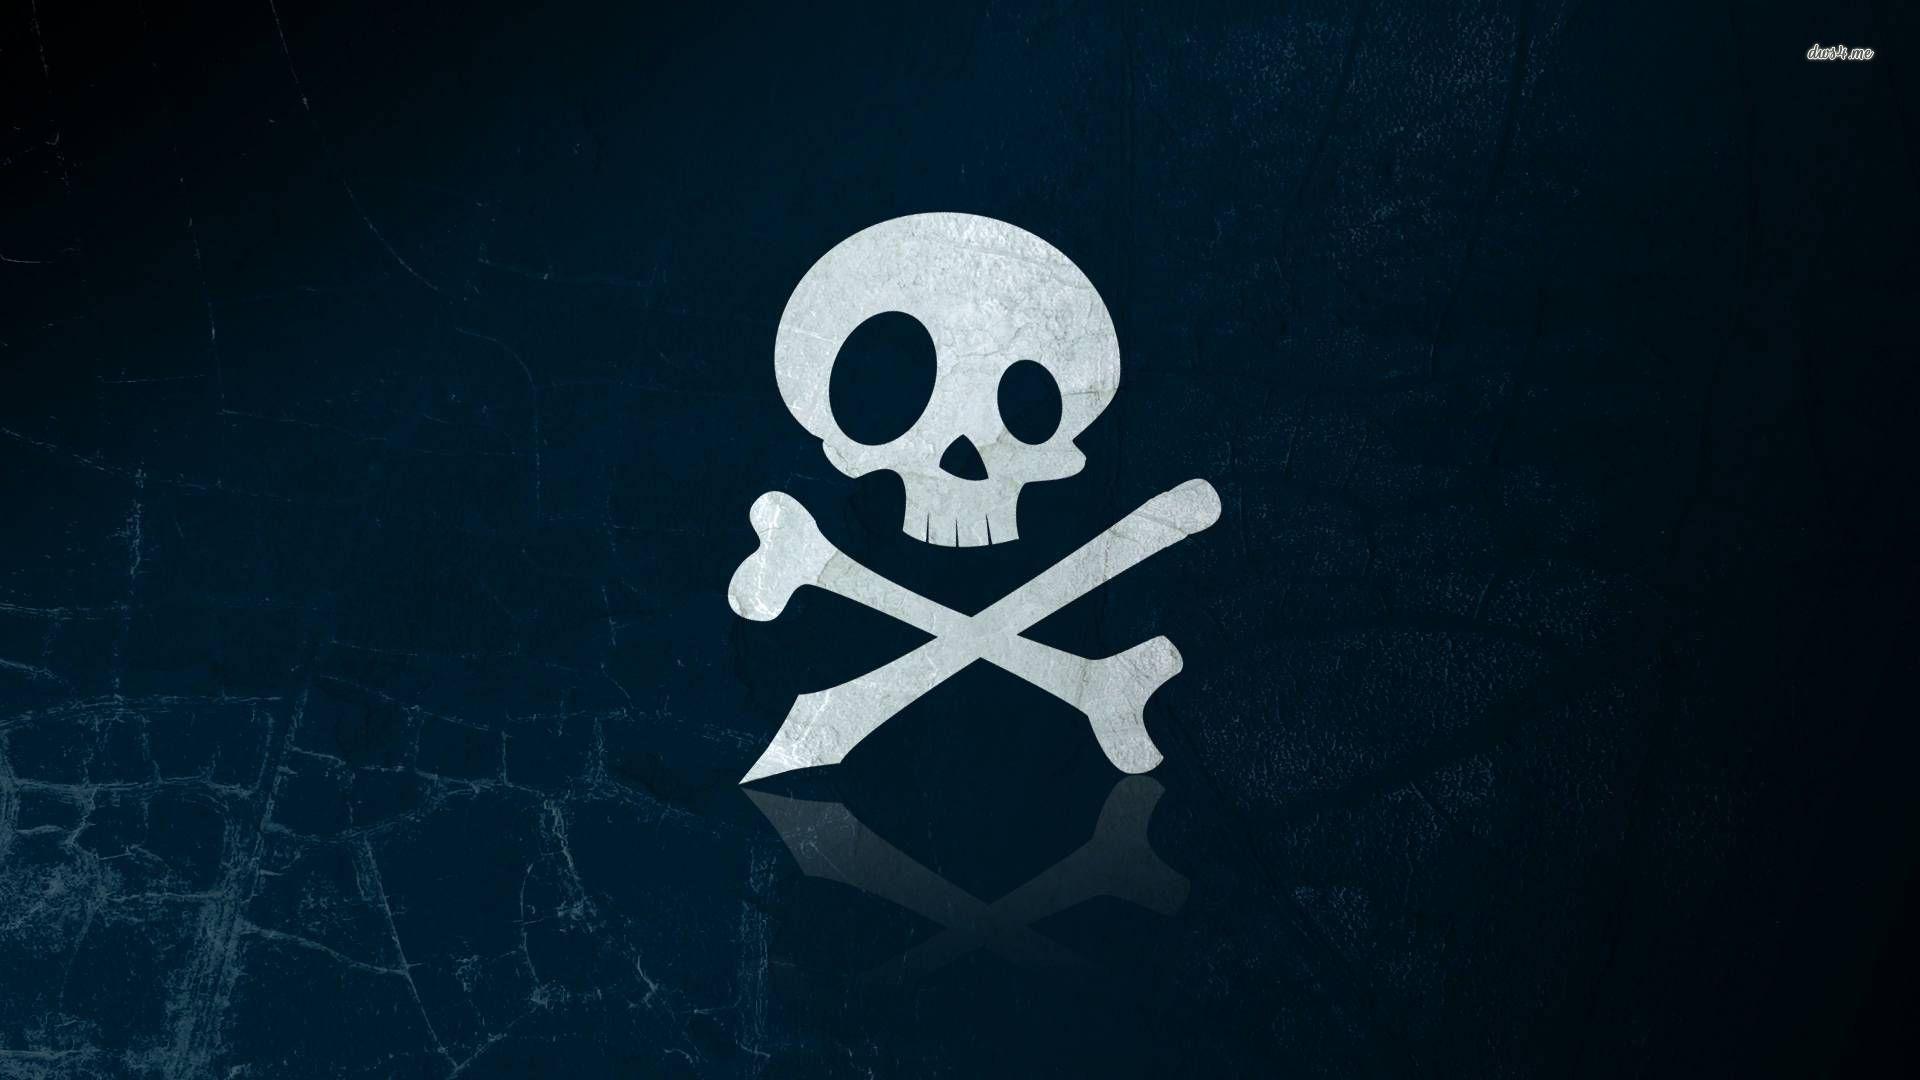 wallpaper skull bones pirate - photo #9